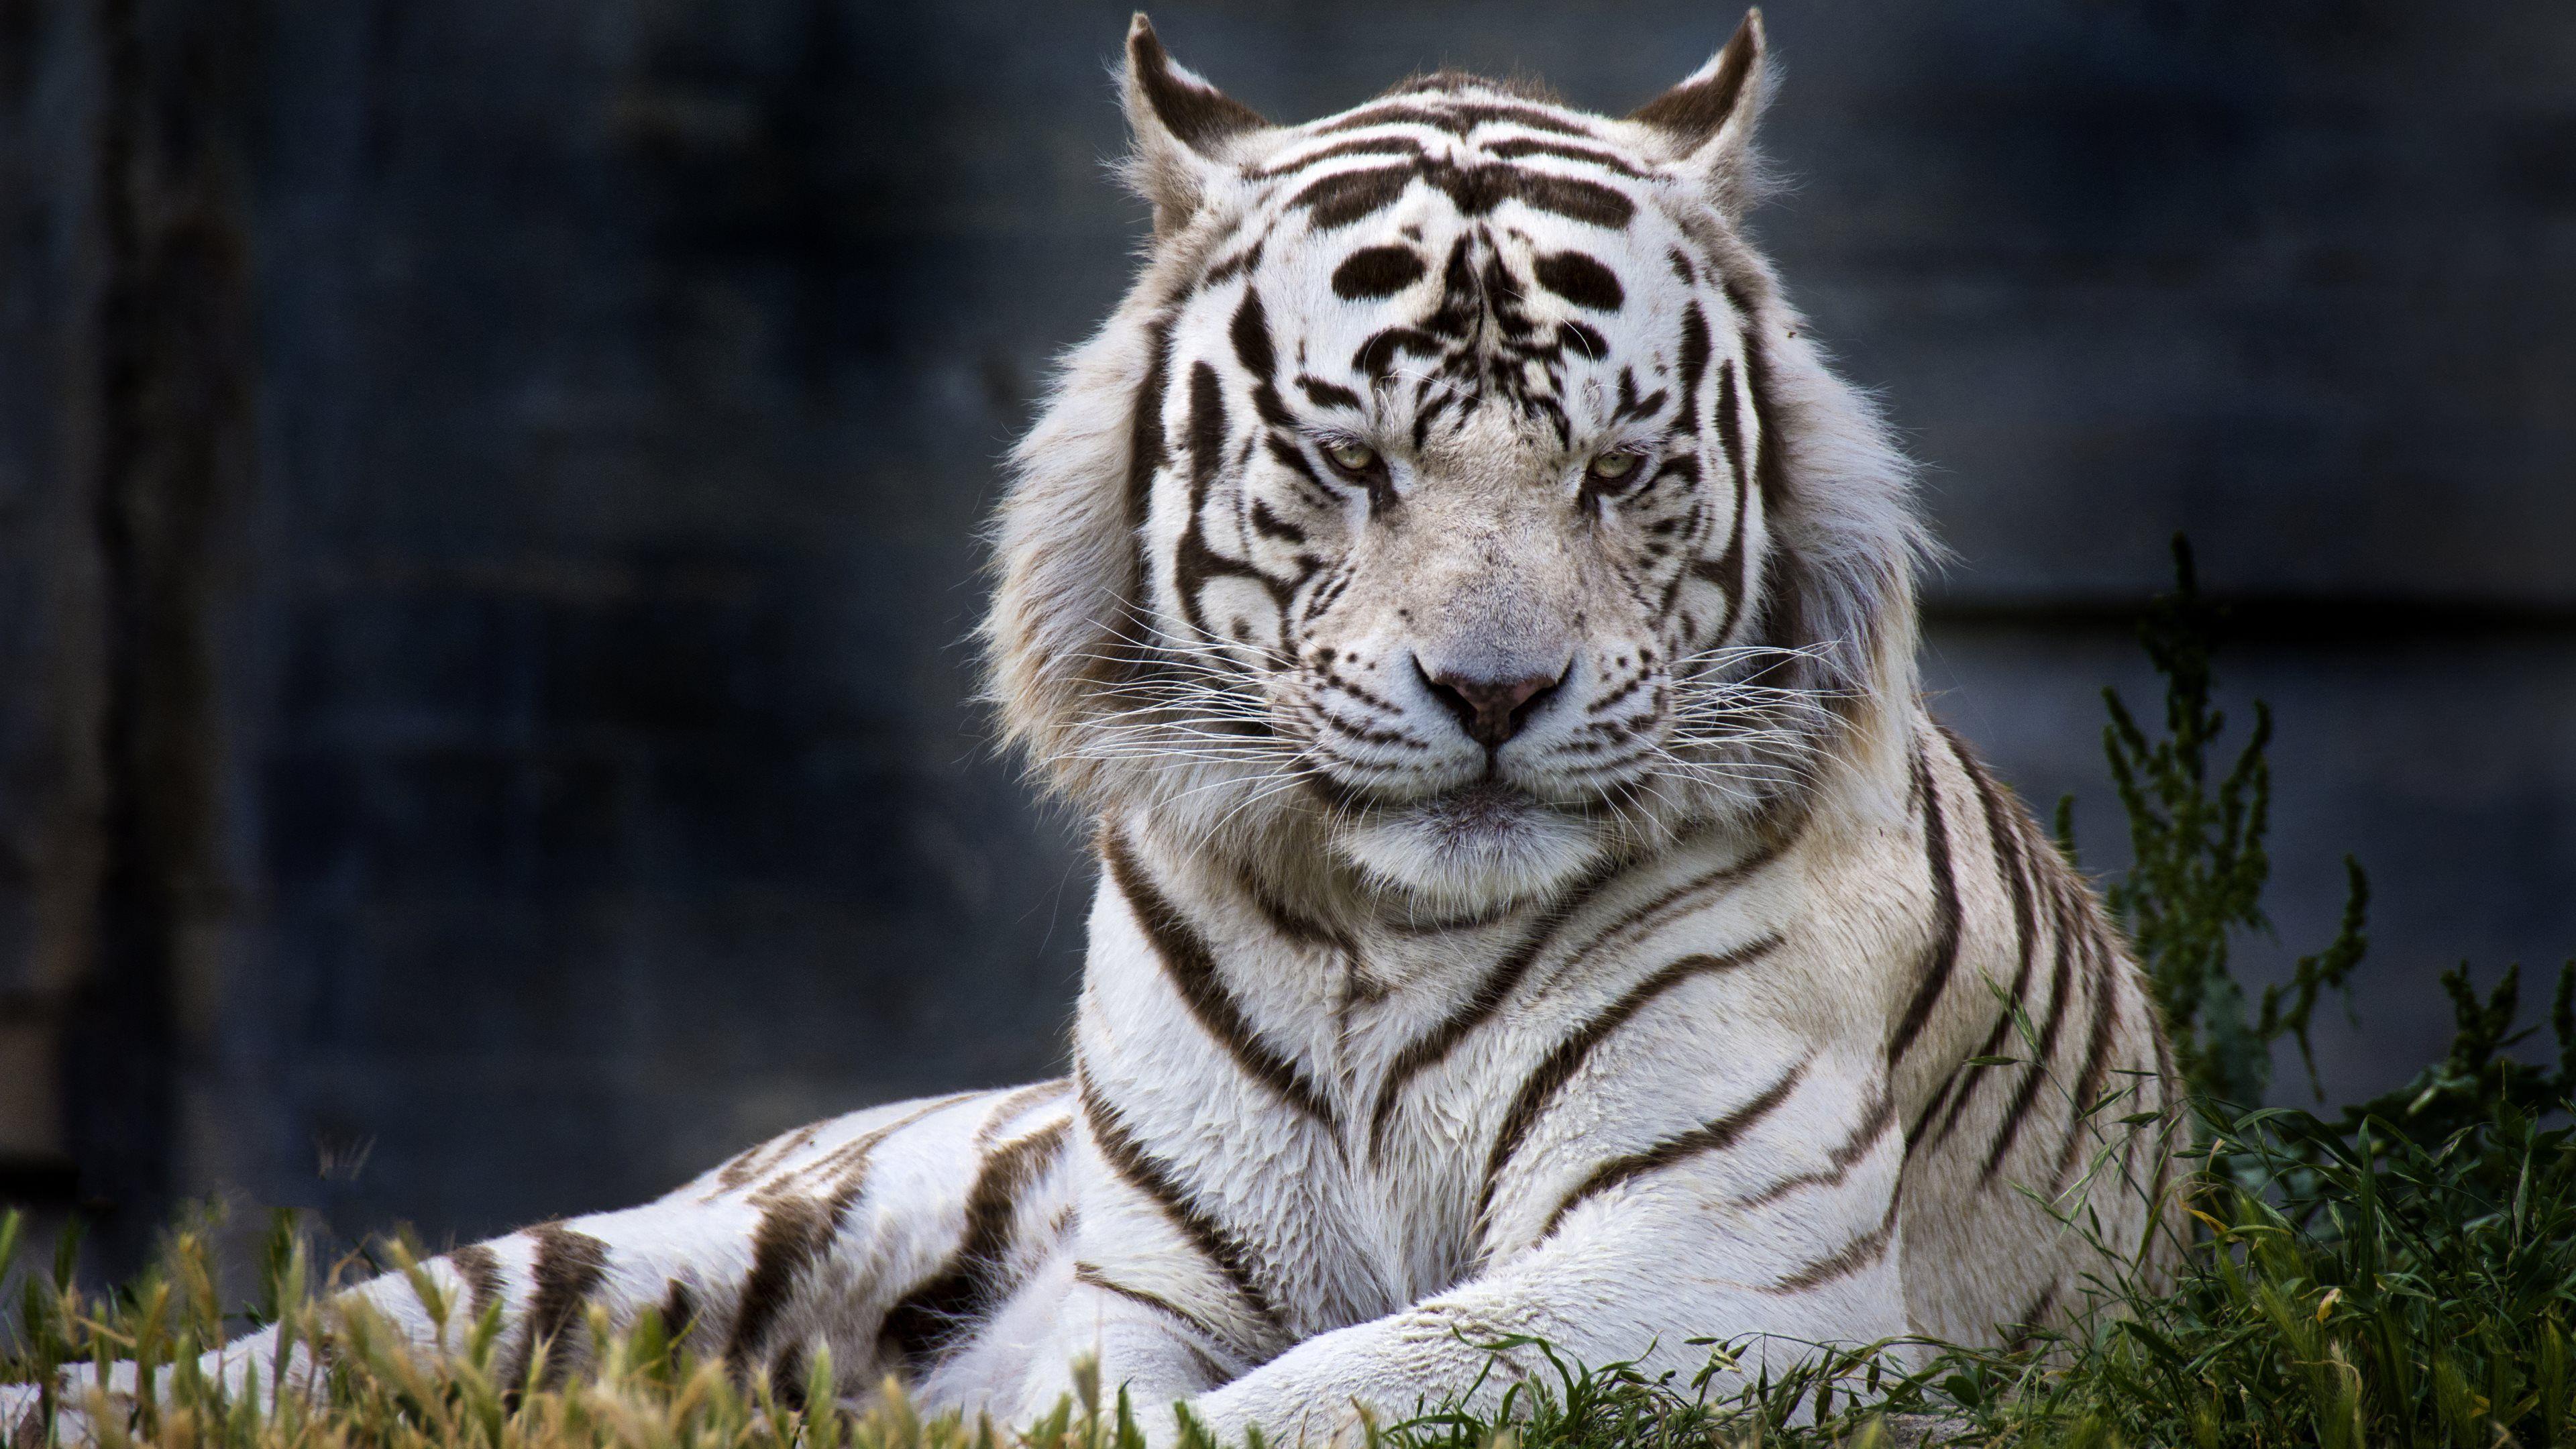 tiger full hd wallpaper desktop backgrounds free download